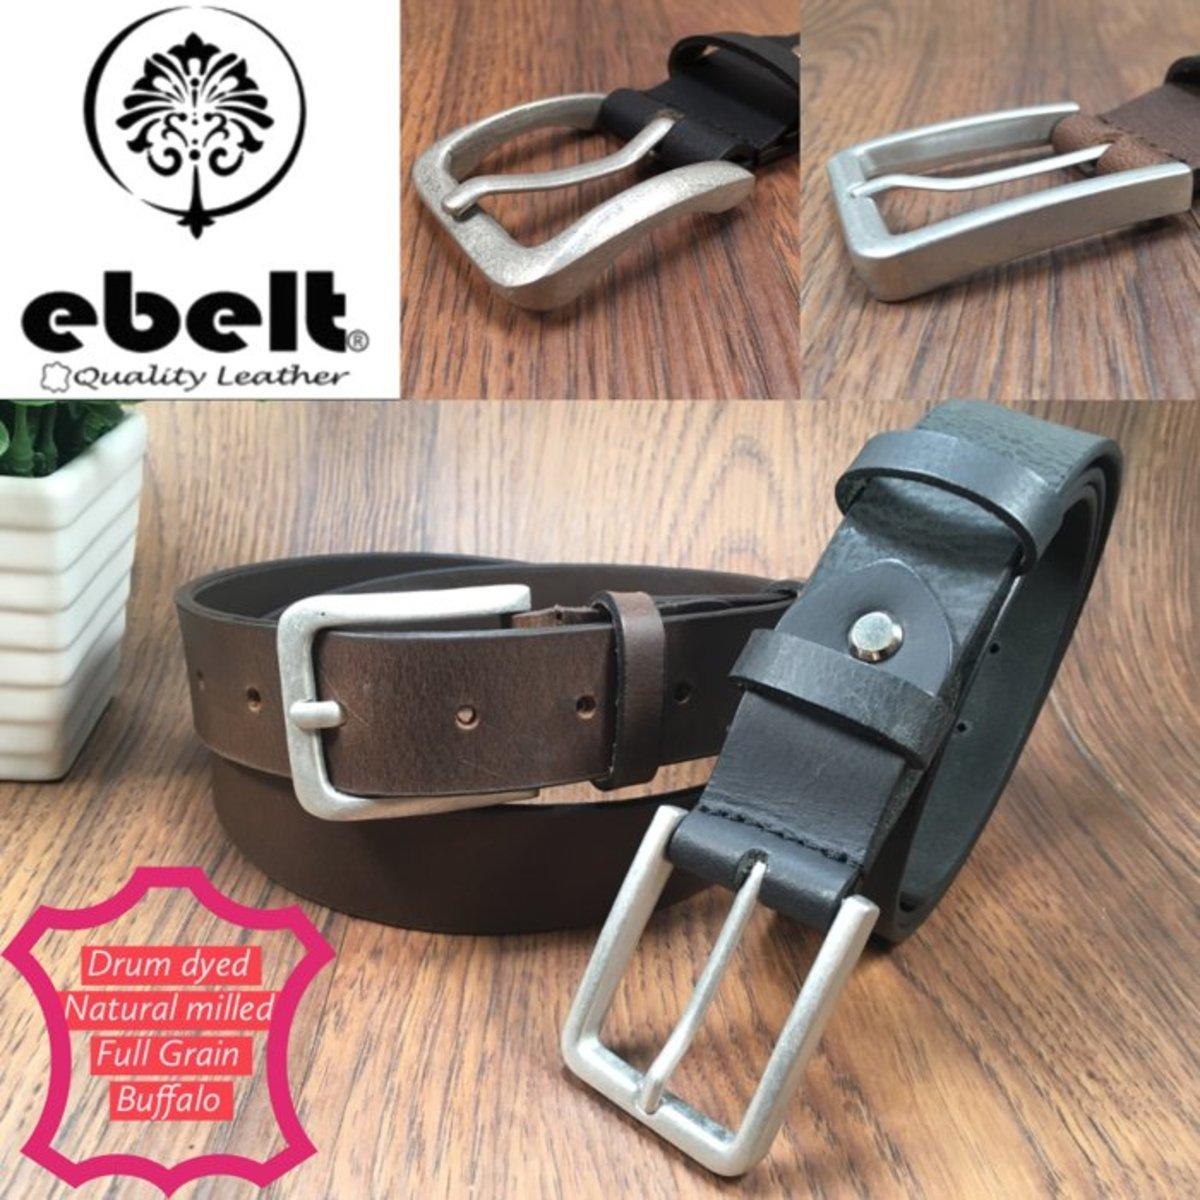 ebelt 印度製 頭層水牛皮皮帶 BUFFALO FULL GRAIN LEATHER BELT 3.2cm- ebc0328